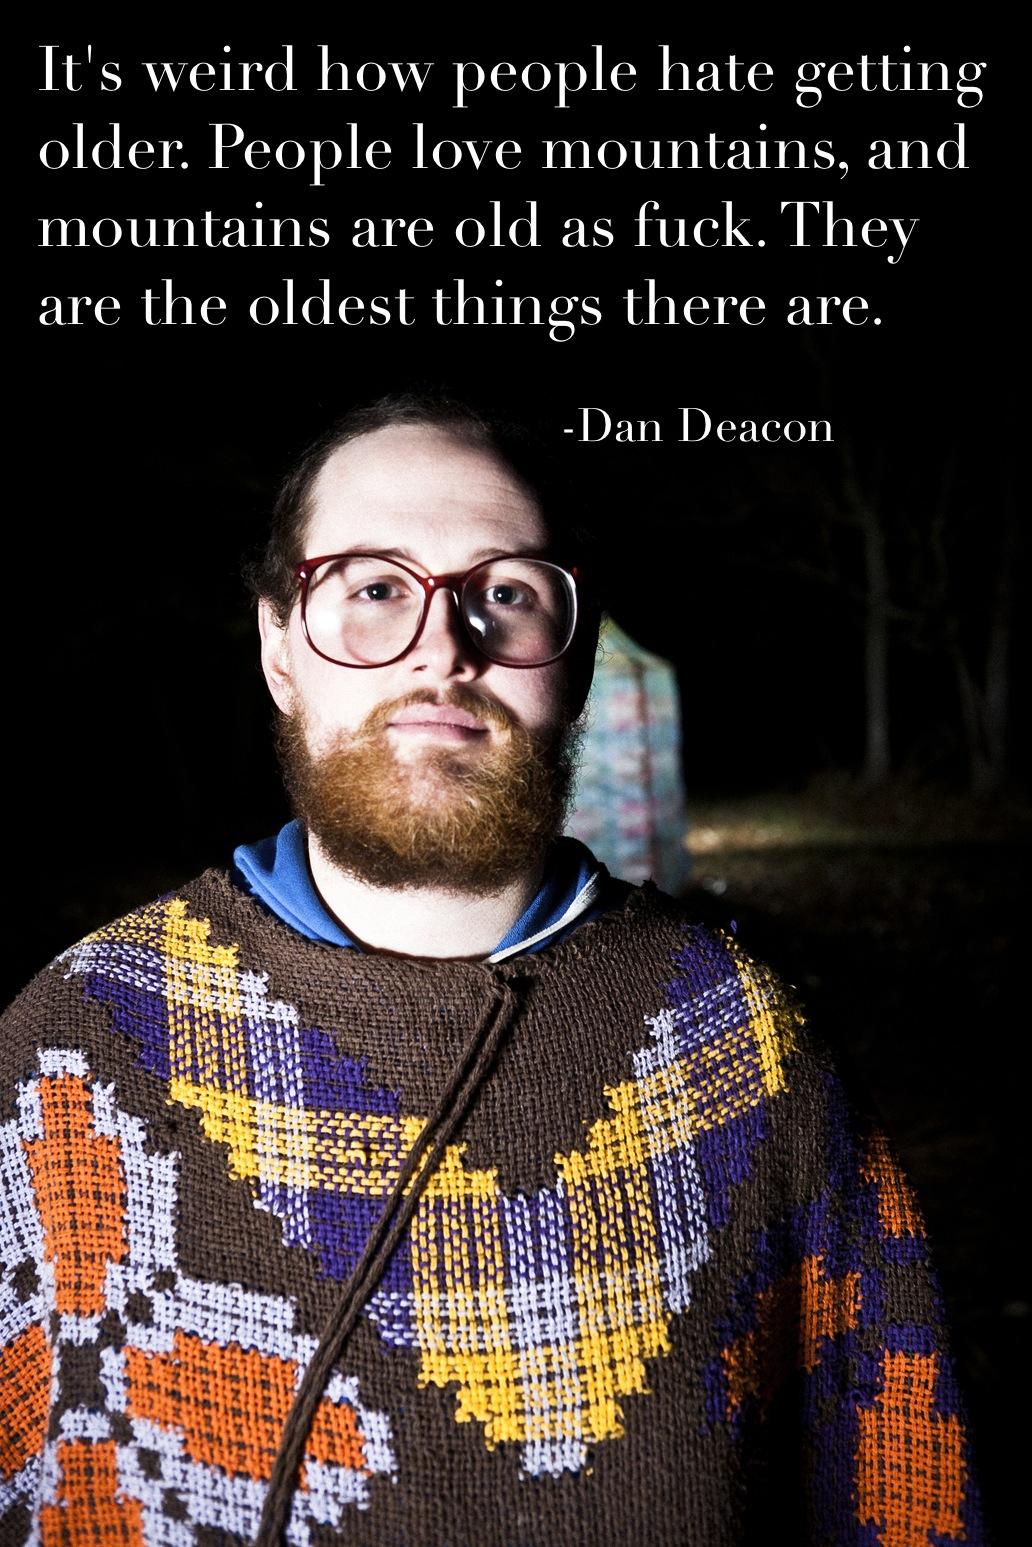 Dan Deacon's quote #1